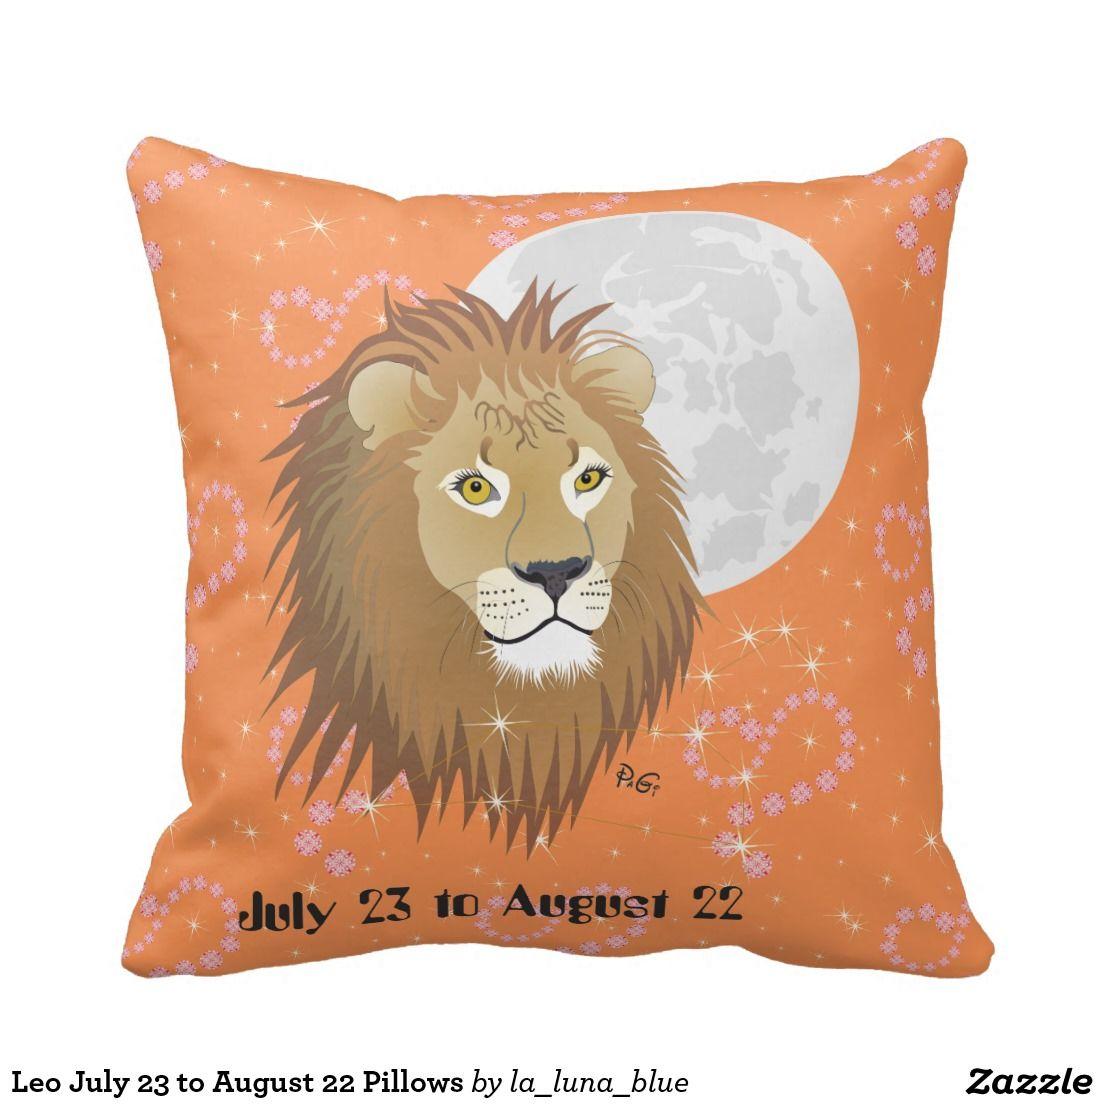 Leo July 23 To August 22 Pillows Kissen Zazzle Ch Kissen